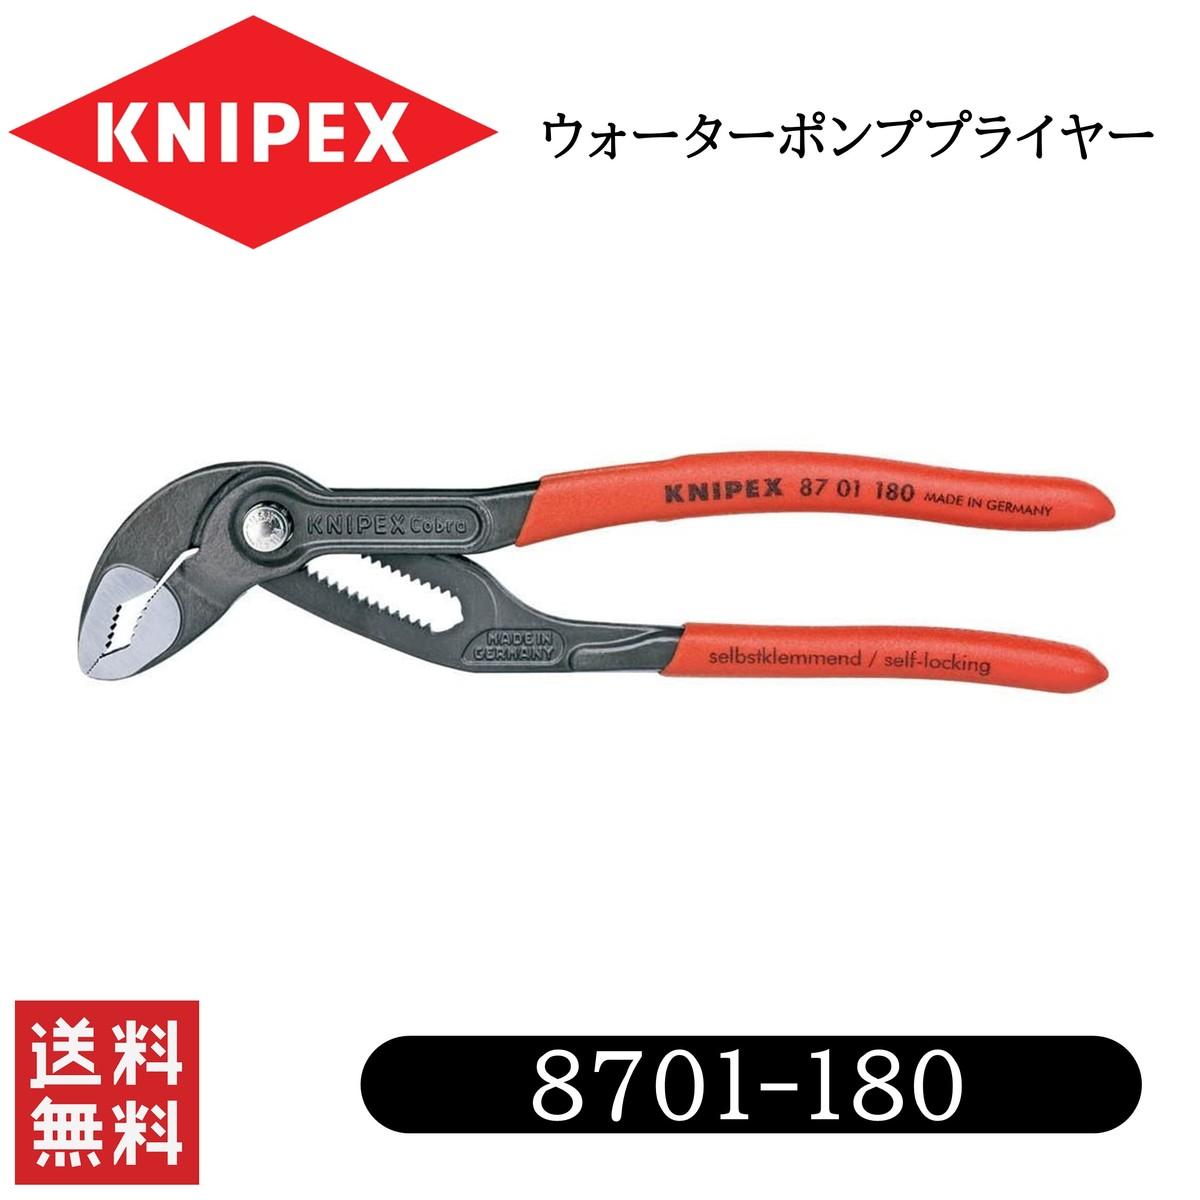 KNIPEX 8701-180 セール開催中最短即日発送 クニペックス 送料込 ウォーターポンププライヤー コブラ DIY 工具